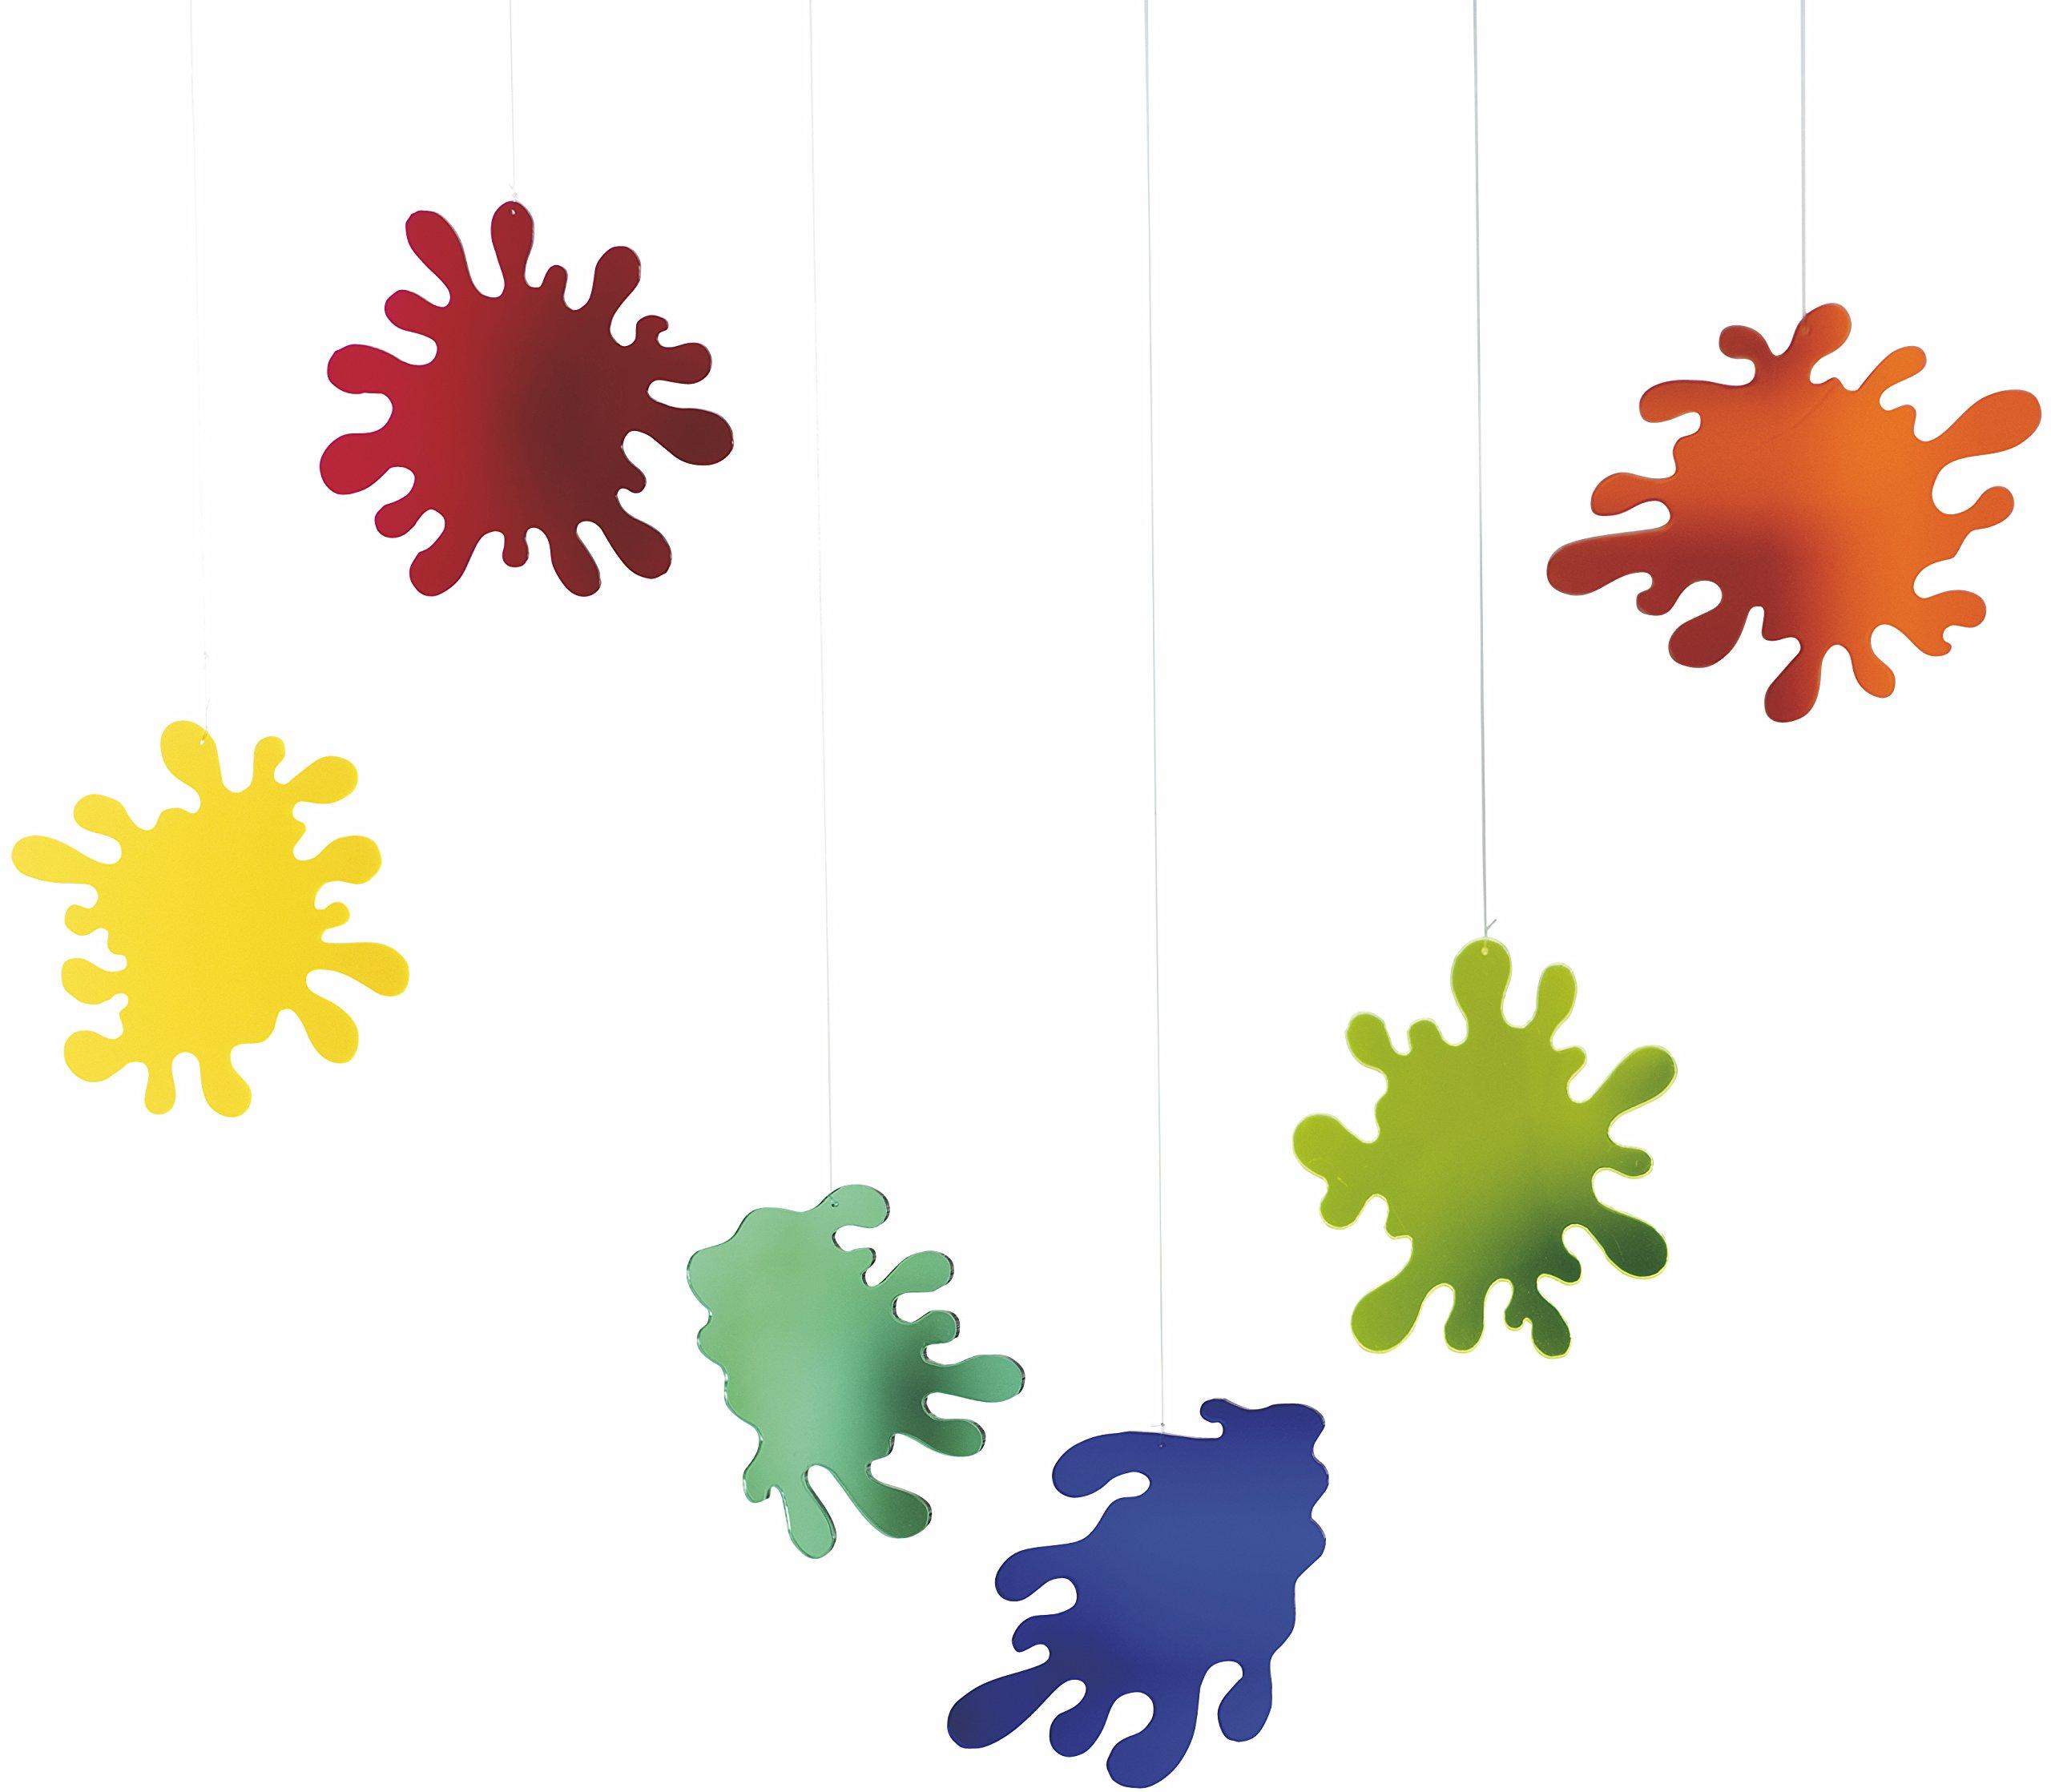 Flensted Mobiles Splash Ll Hanging Mobile - 23 Inches Plastic